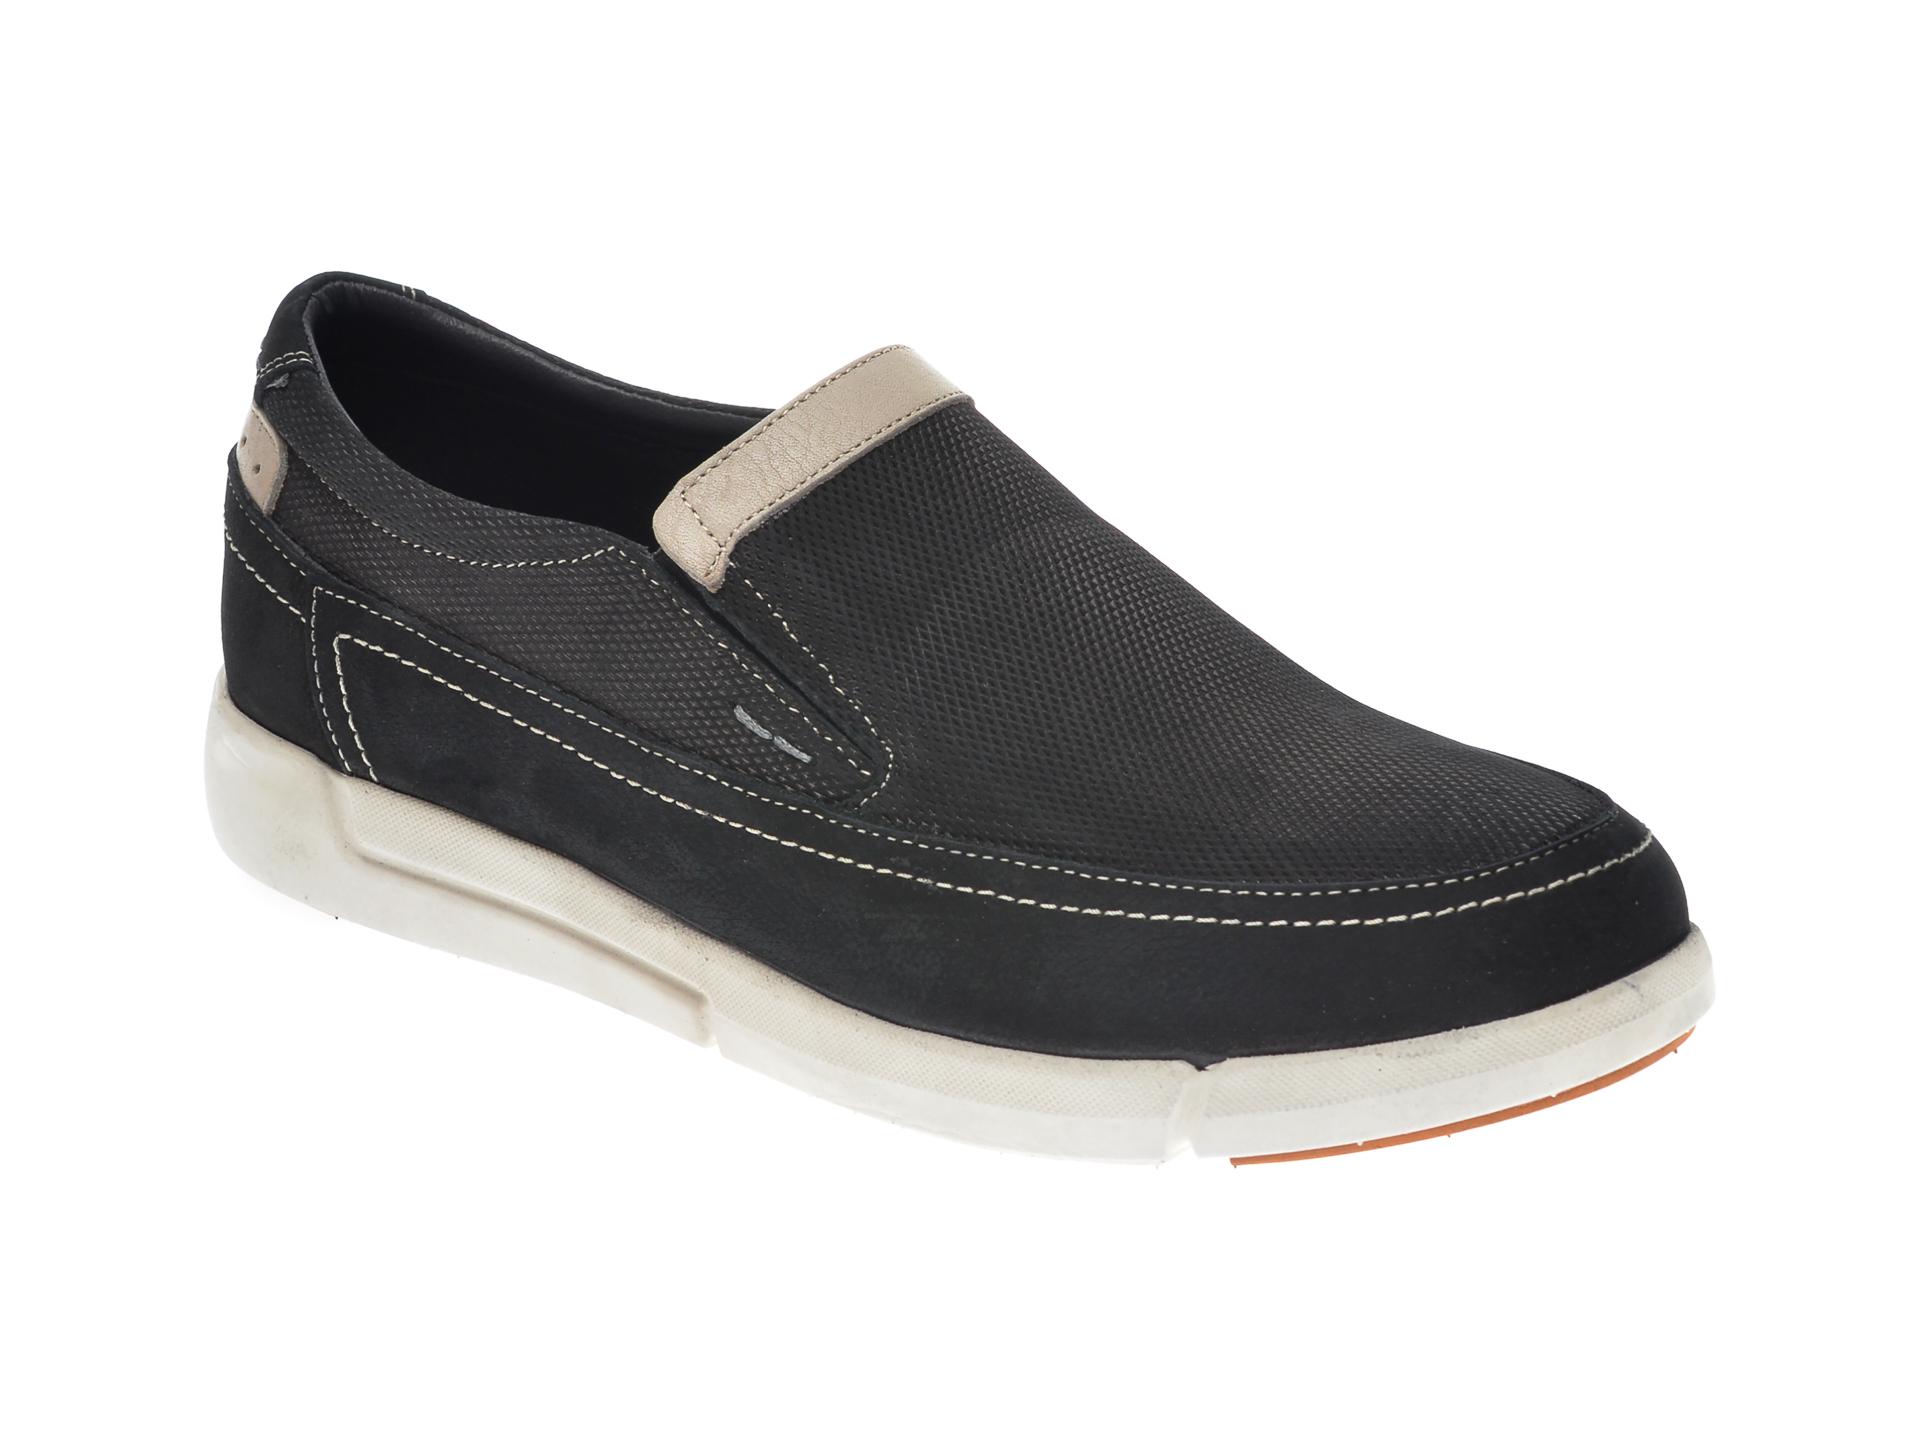 Pantofi OTTER negri, SF4014, din nabuc New